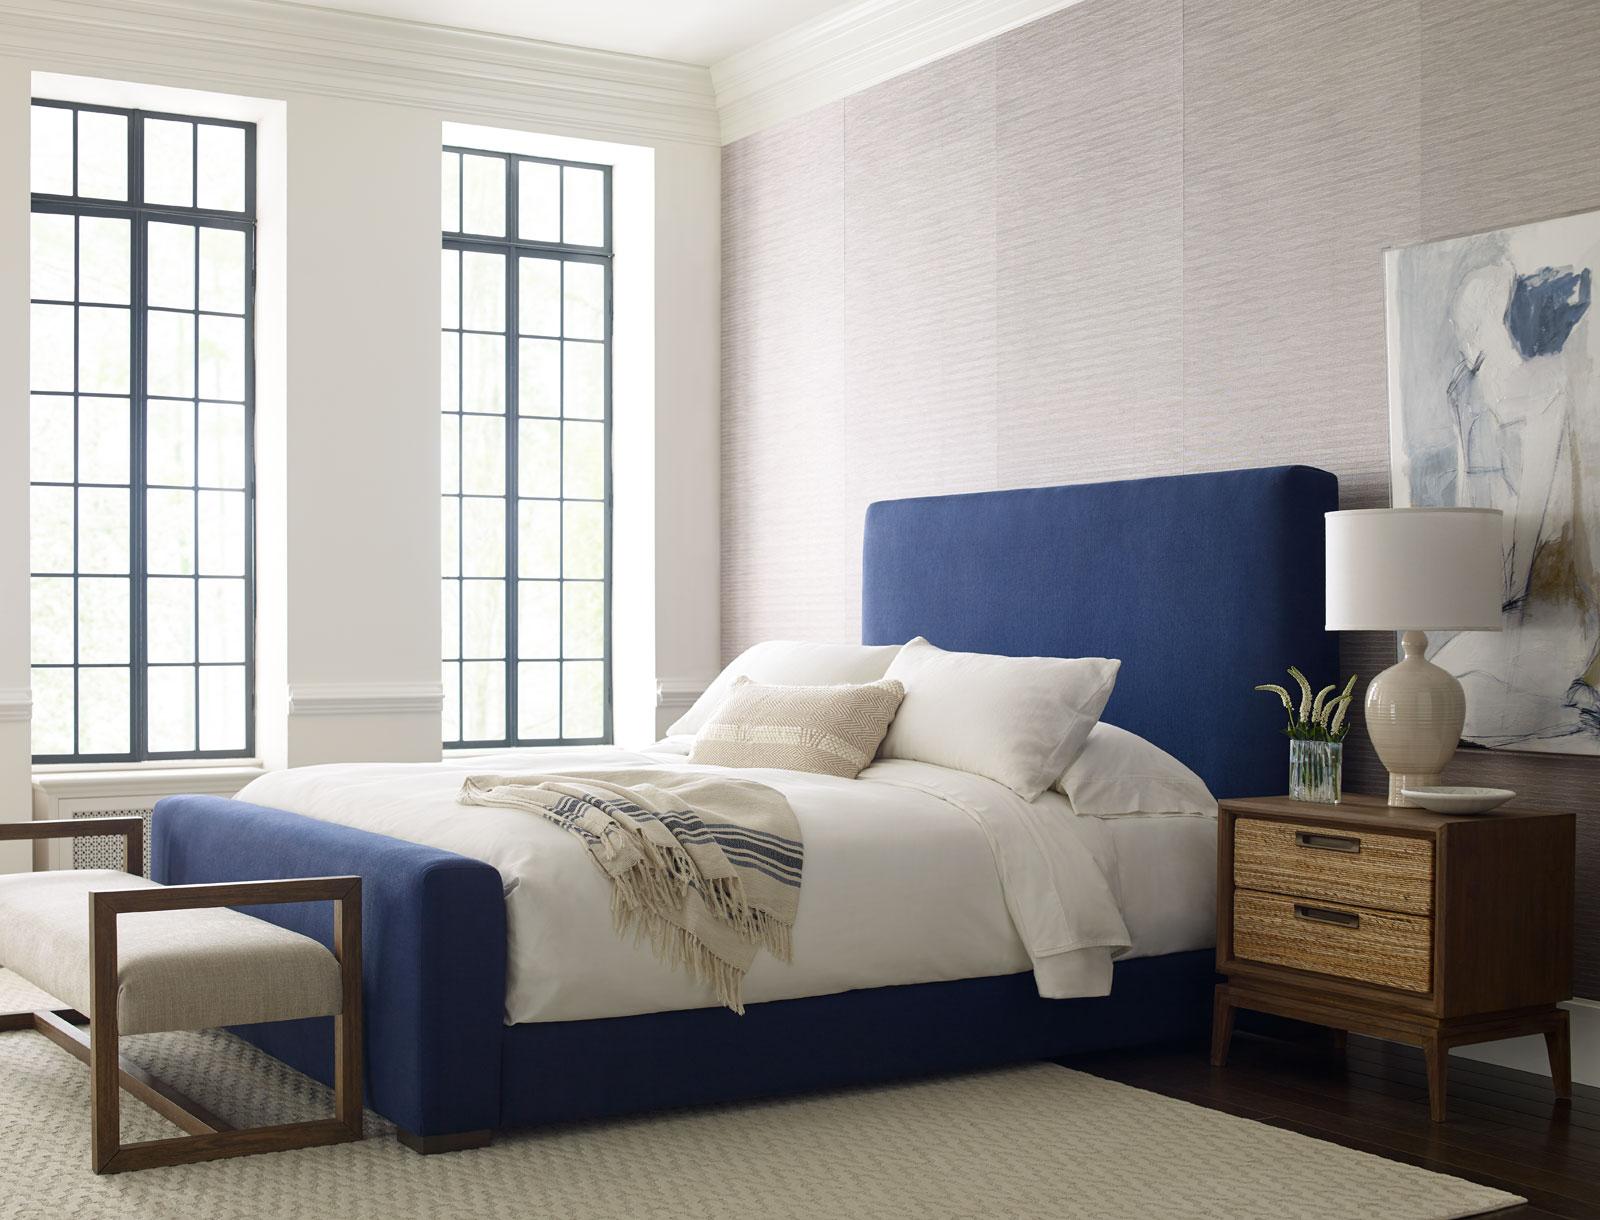 Gentry Bed